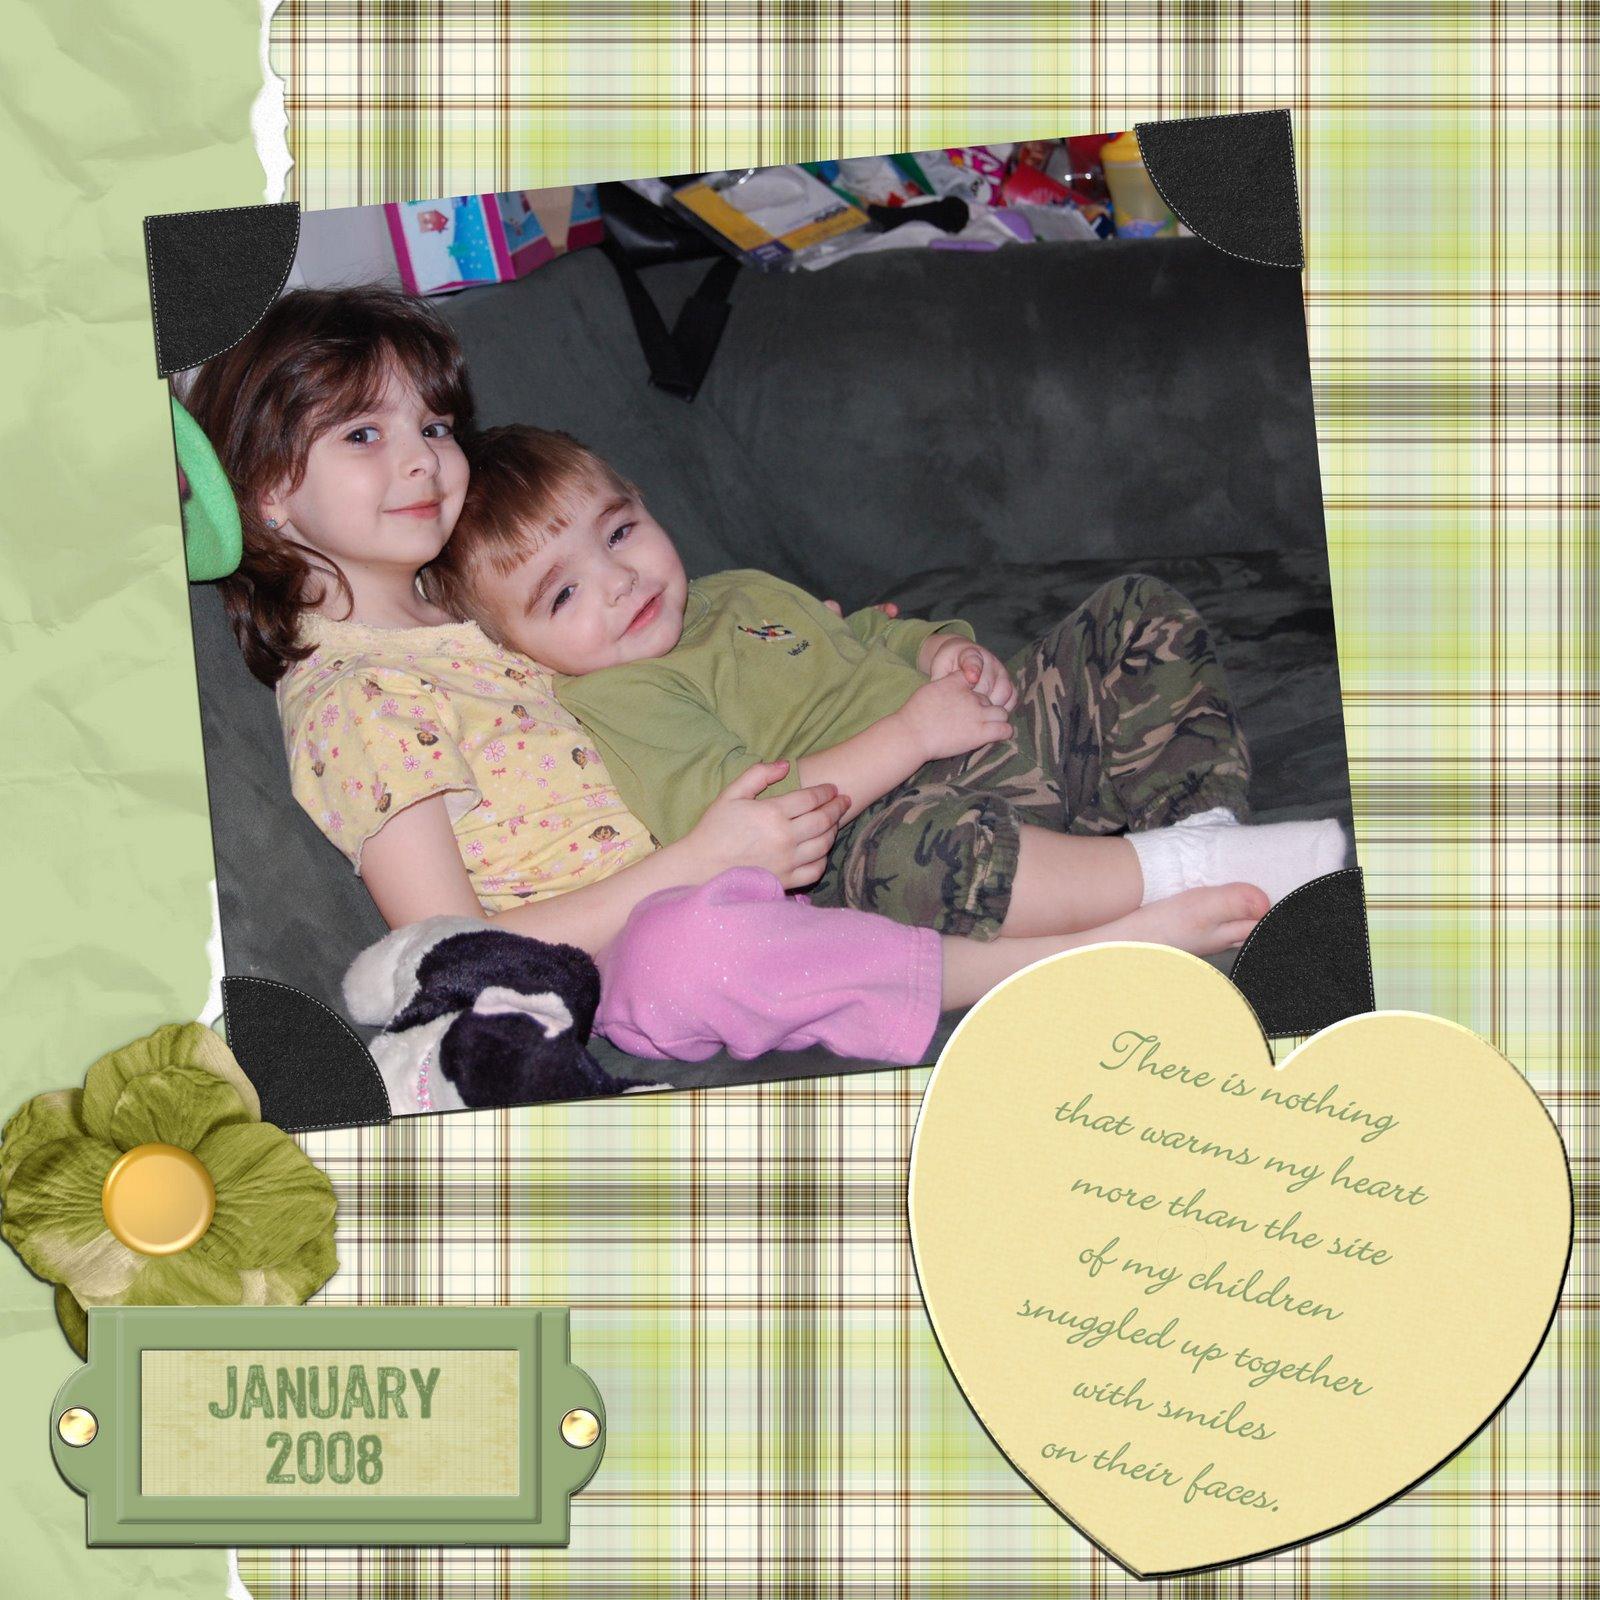 [snuggly+kids+1-08.jpg]